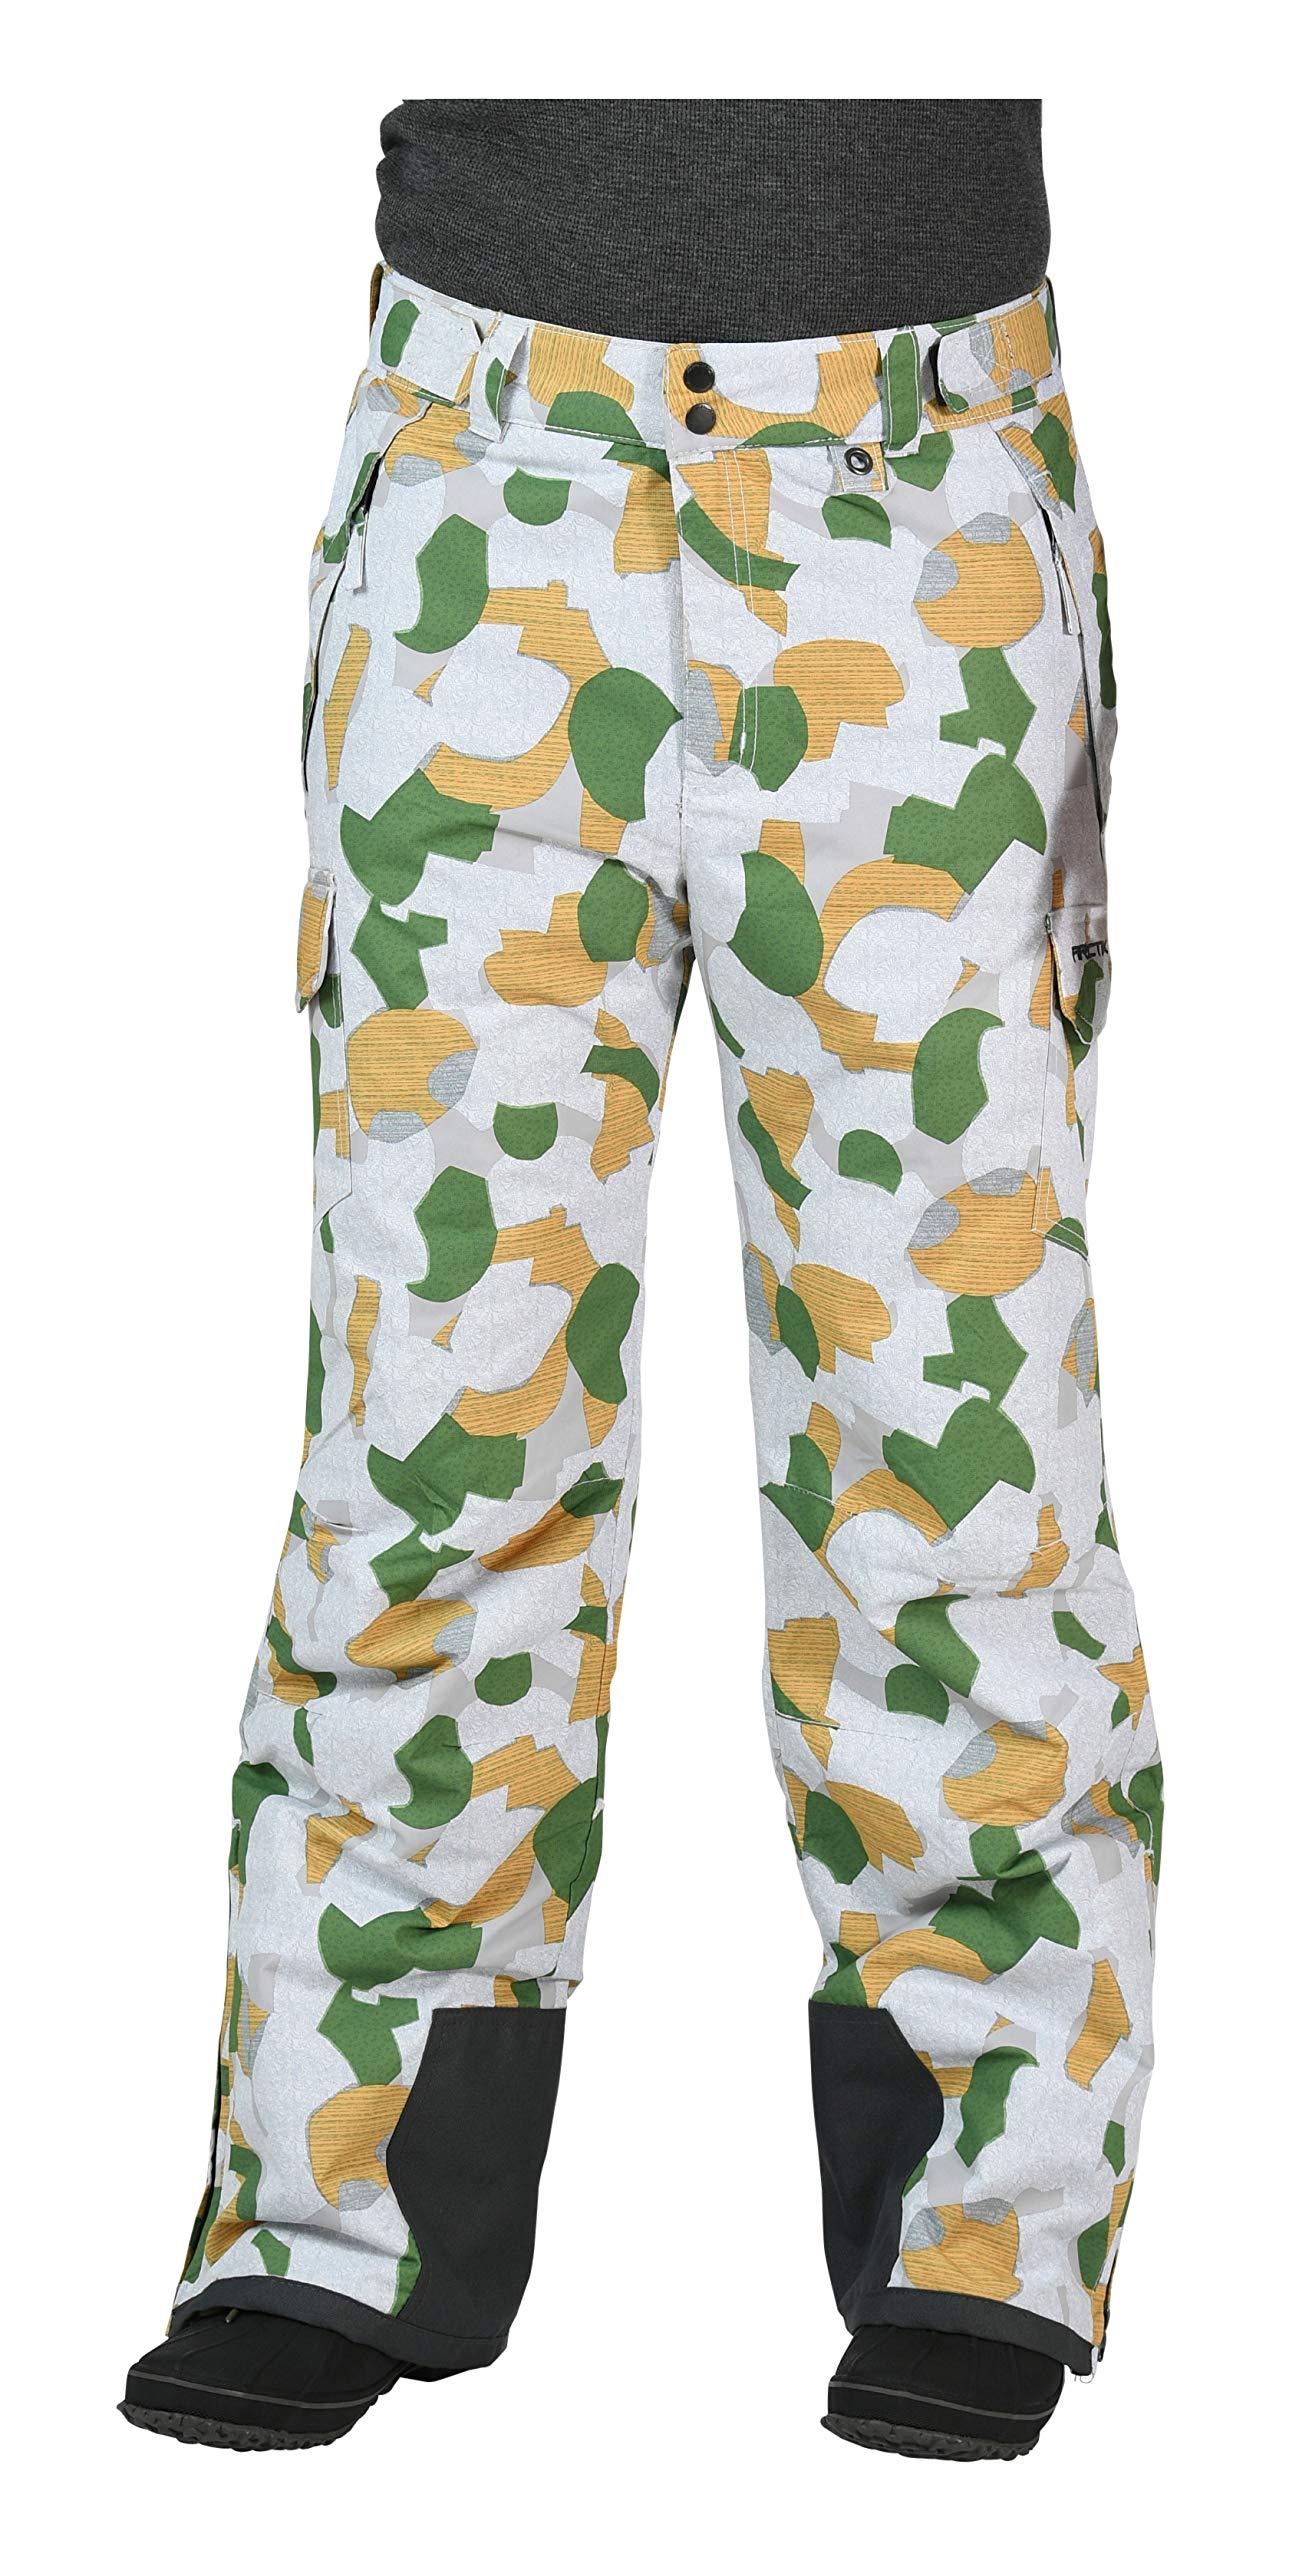 Arctix Men's Snow Sports Cargo Pants, Small, Green GEO